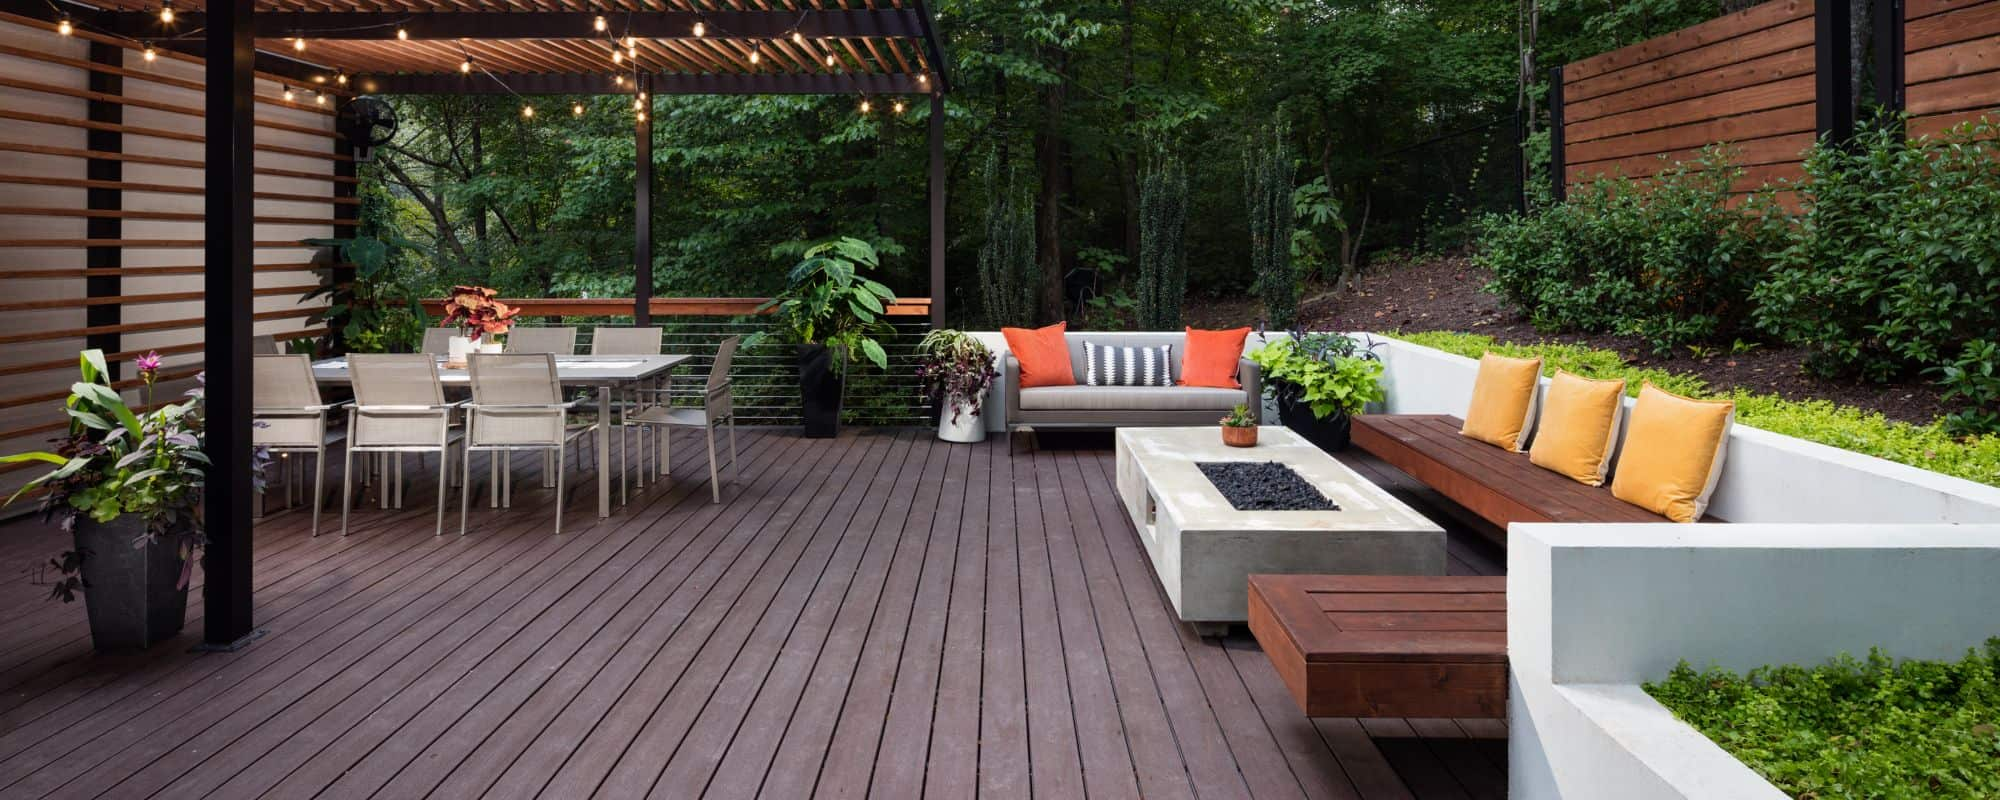 atlanta home remodeling outdoor living